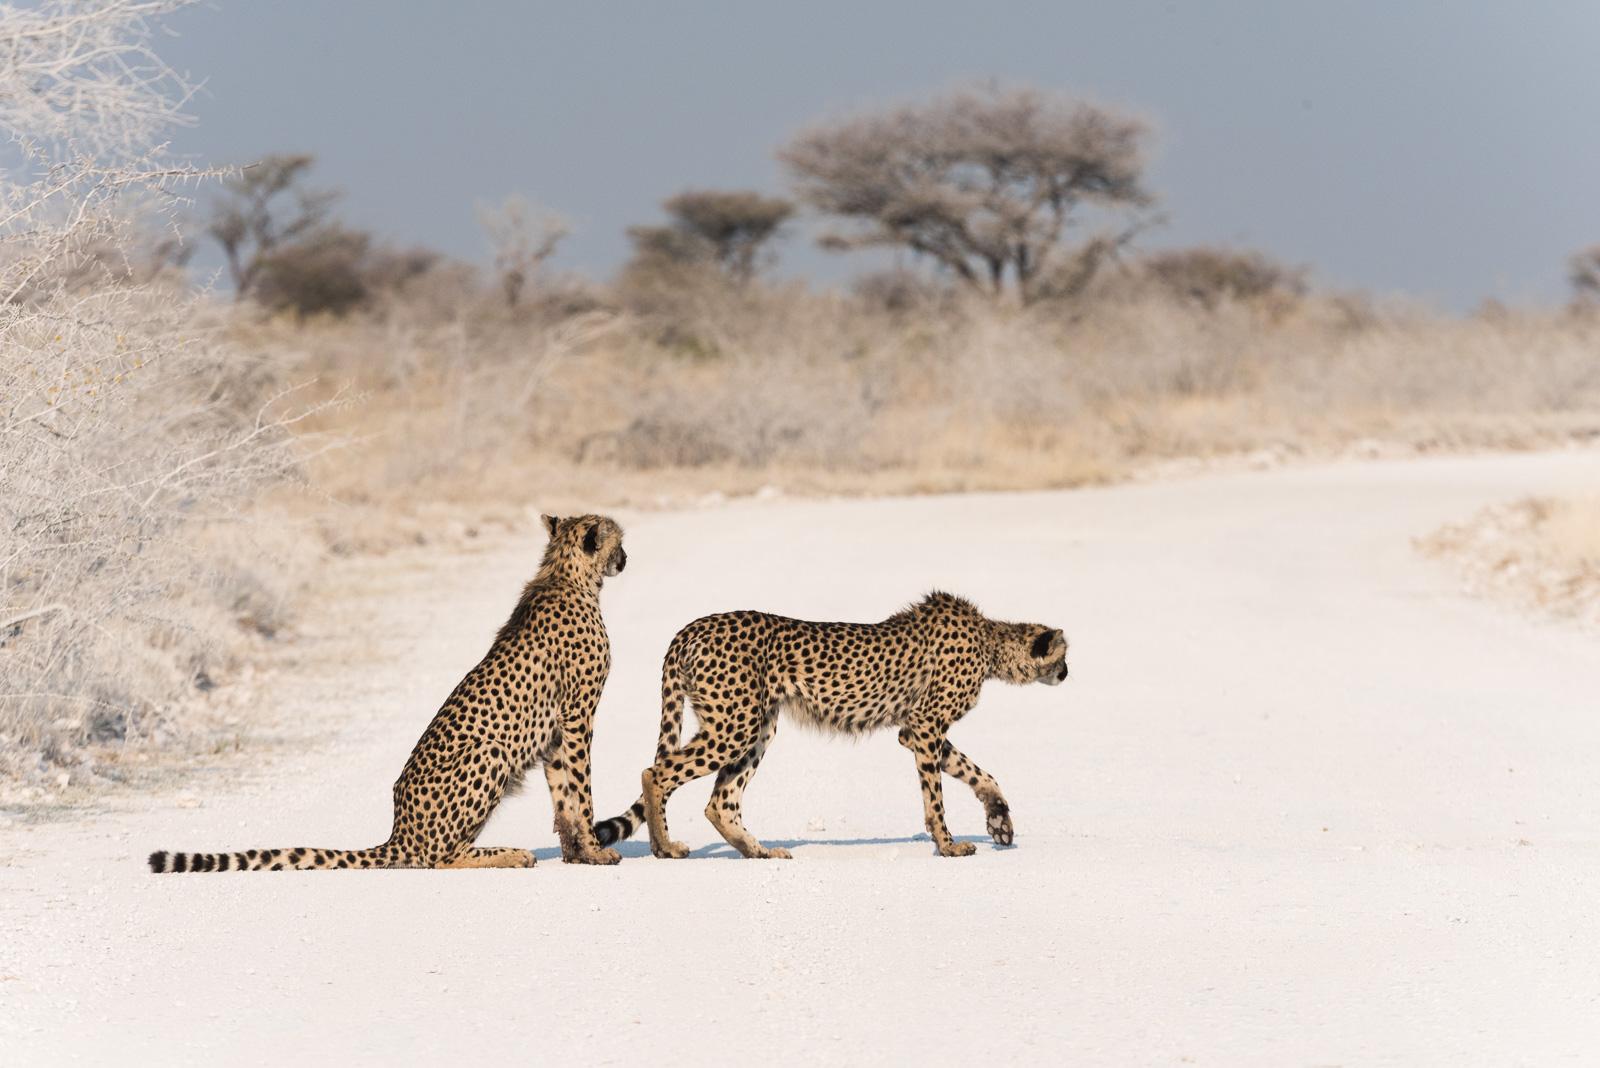 Cheetah Coalition